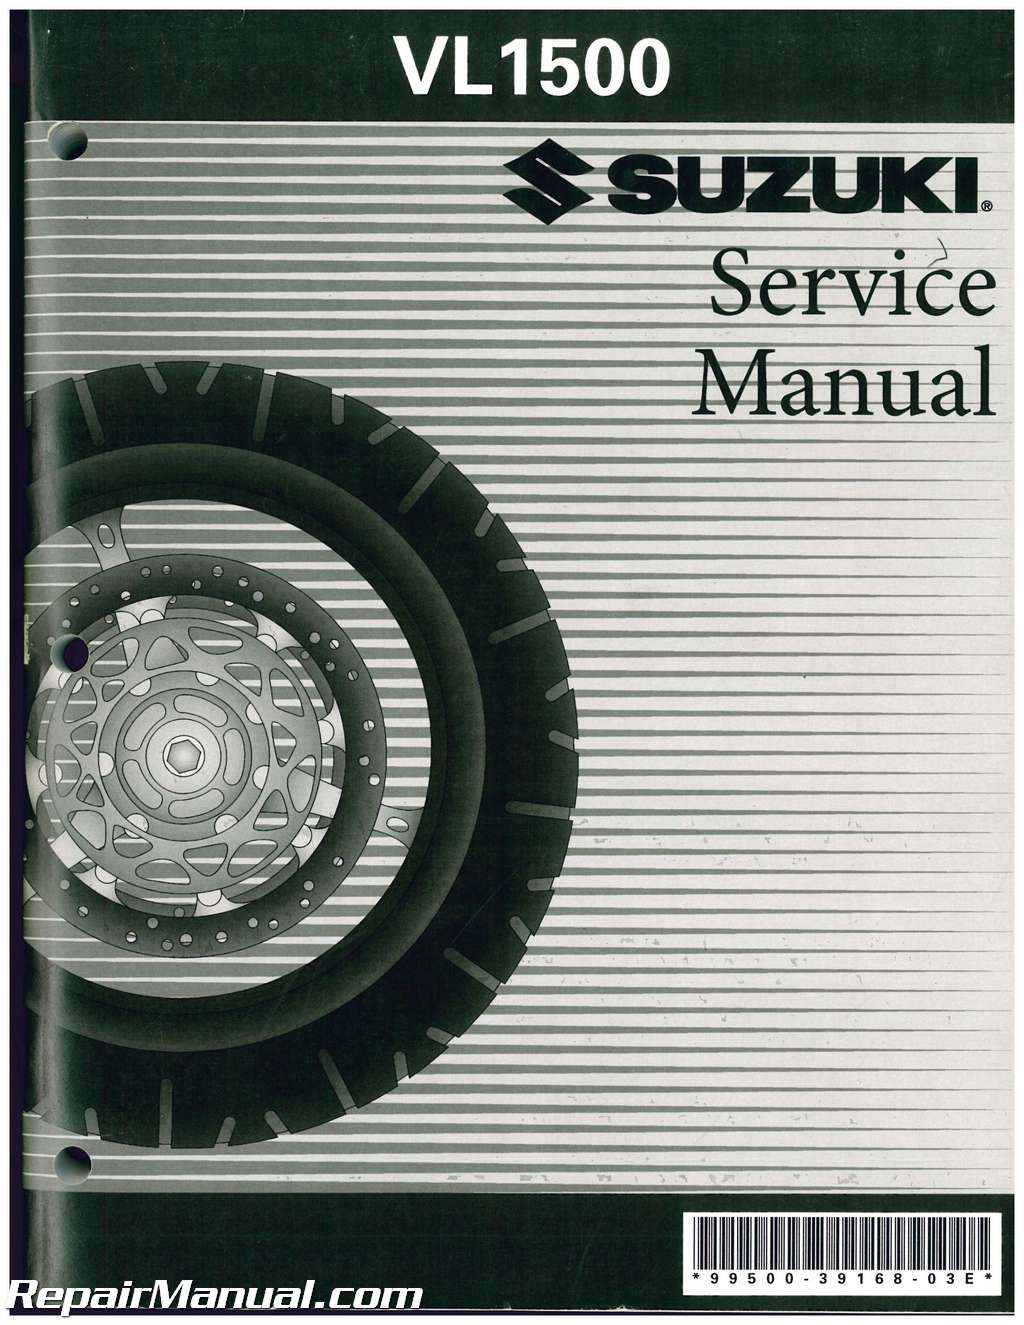 1998-2006 Suzuki VL1500 Intruder Boulevard C90 C90T Motorcycle Service  Manual